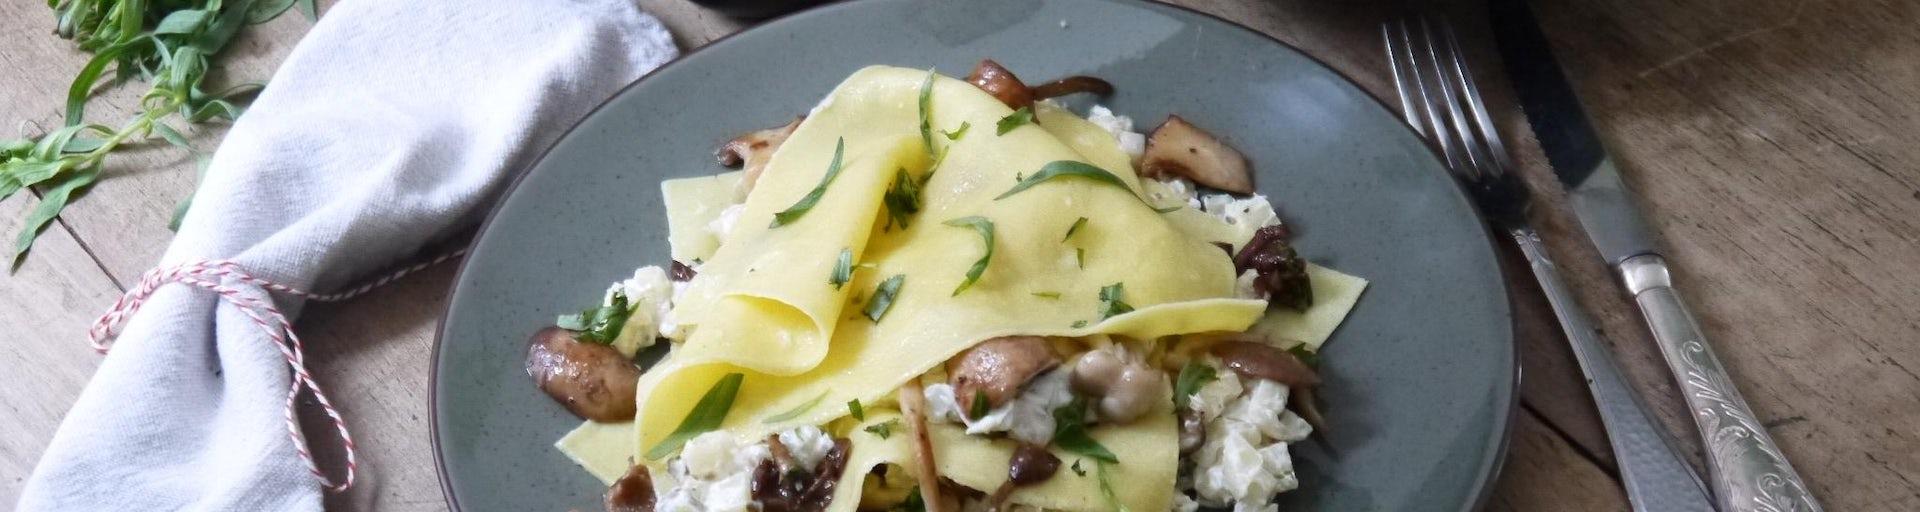 Wk 47 open paddenstoelen lasagne FP